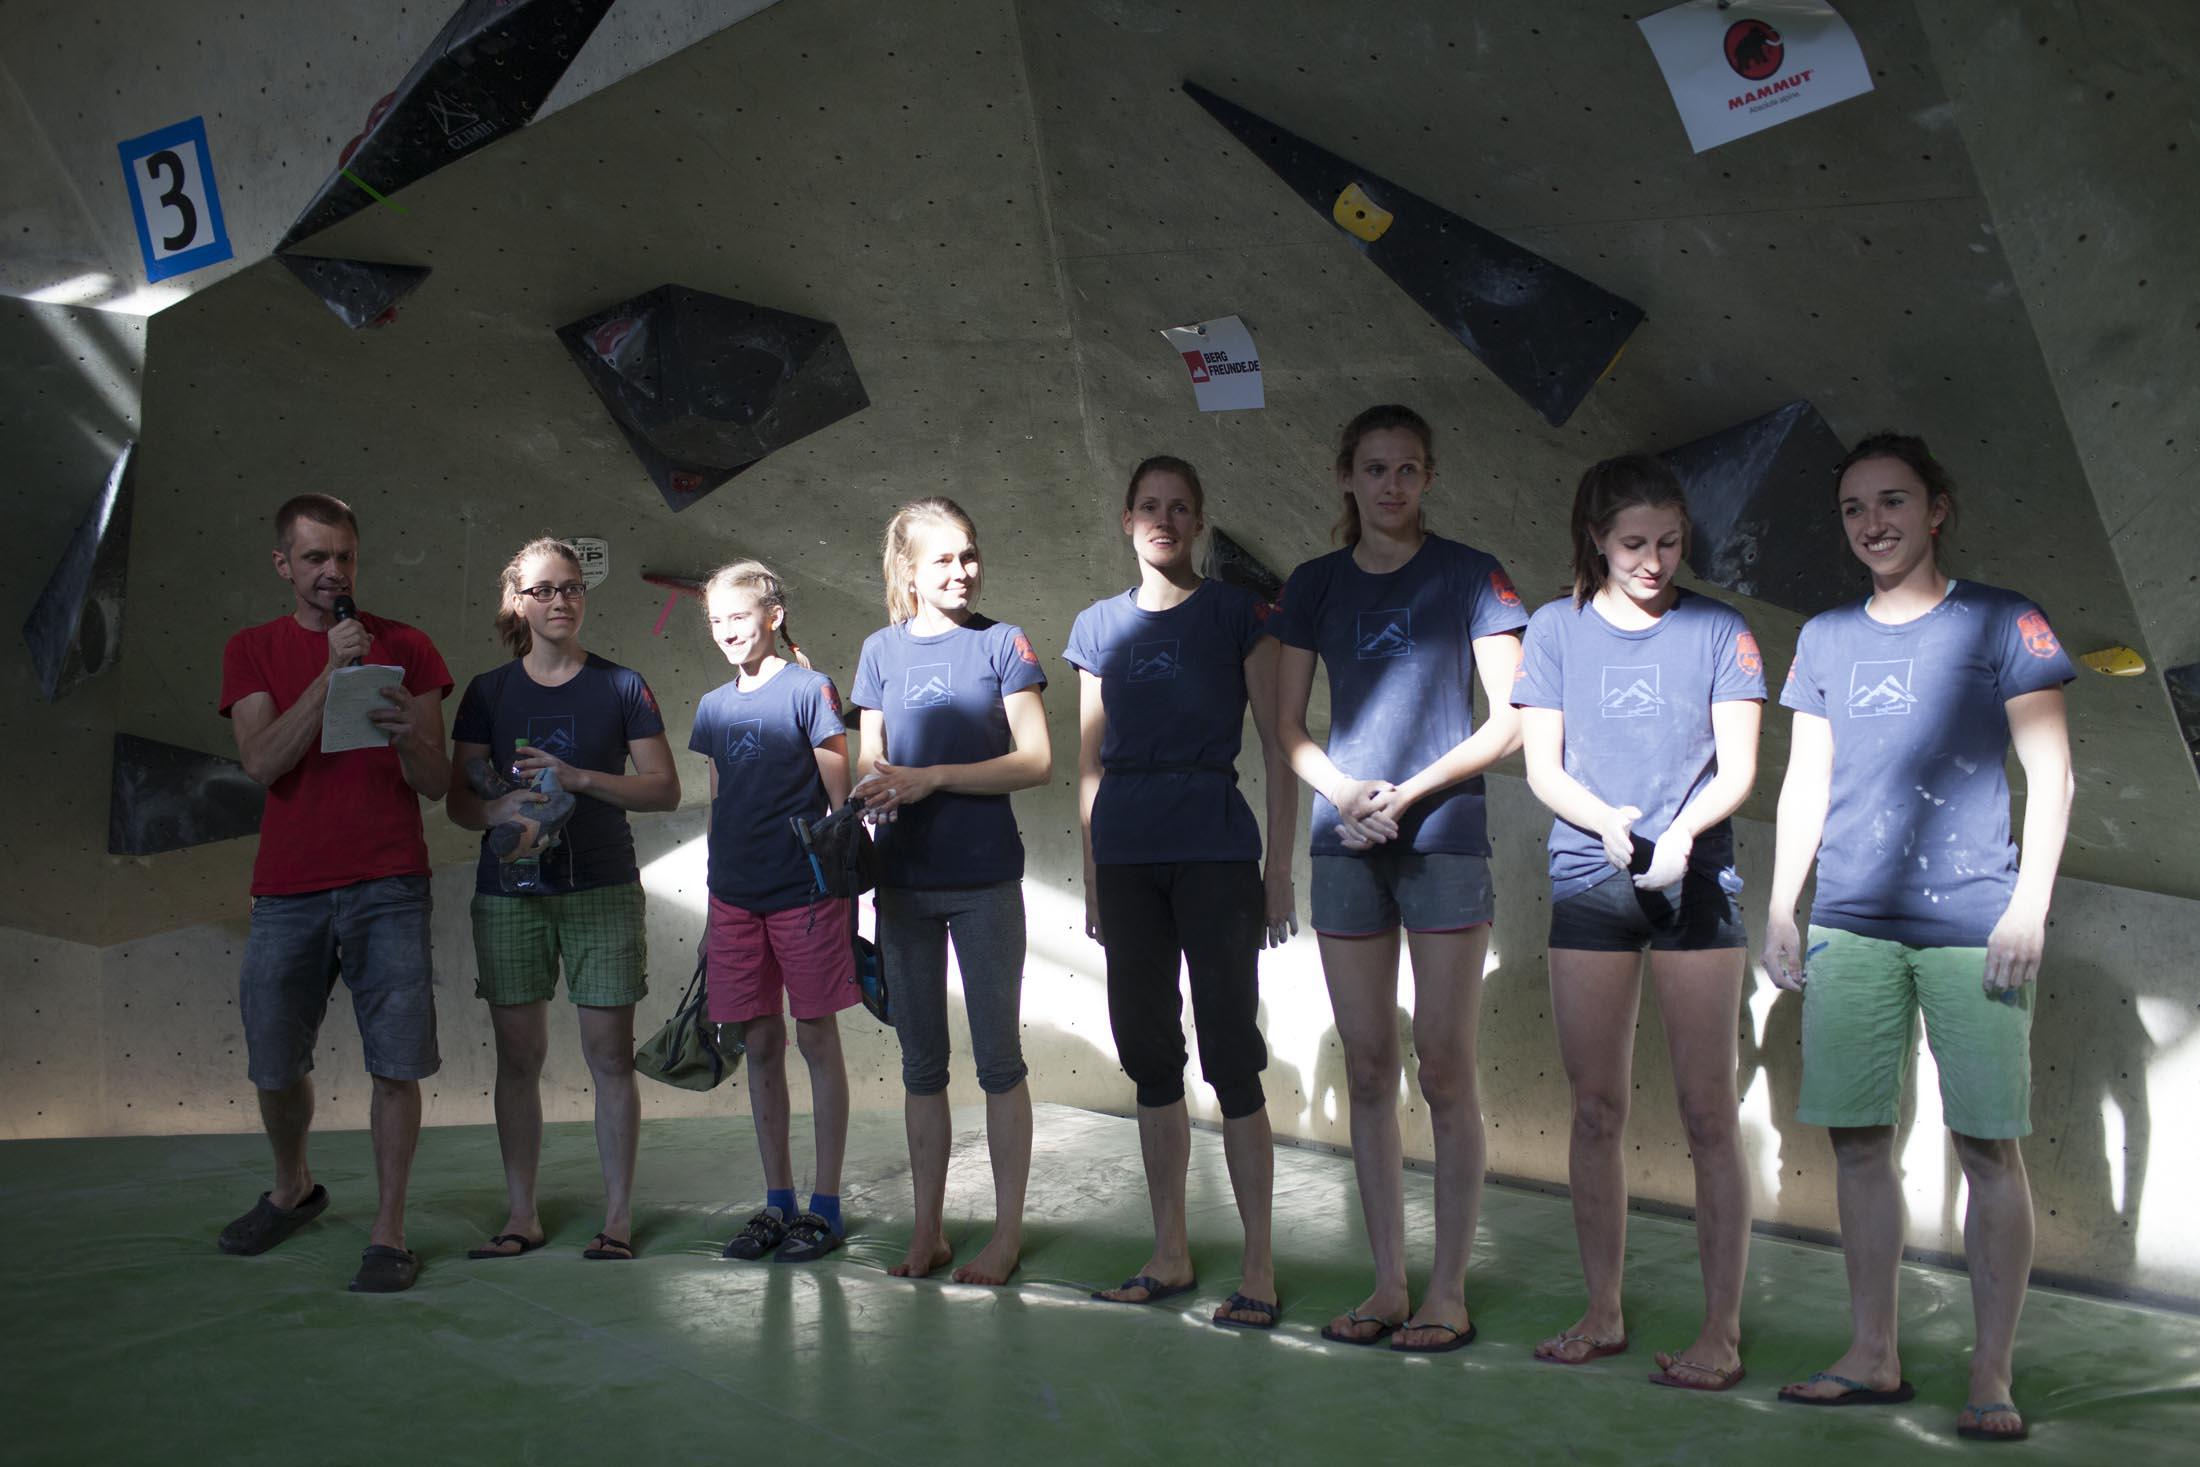 Juliane Wurm, internationaler bouldercup Frankenjura, BLOCKHELDEN Erlangen, Bergfreunde.de, Mammut07092016038